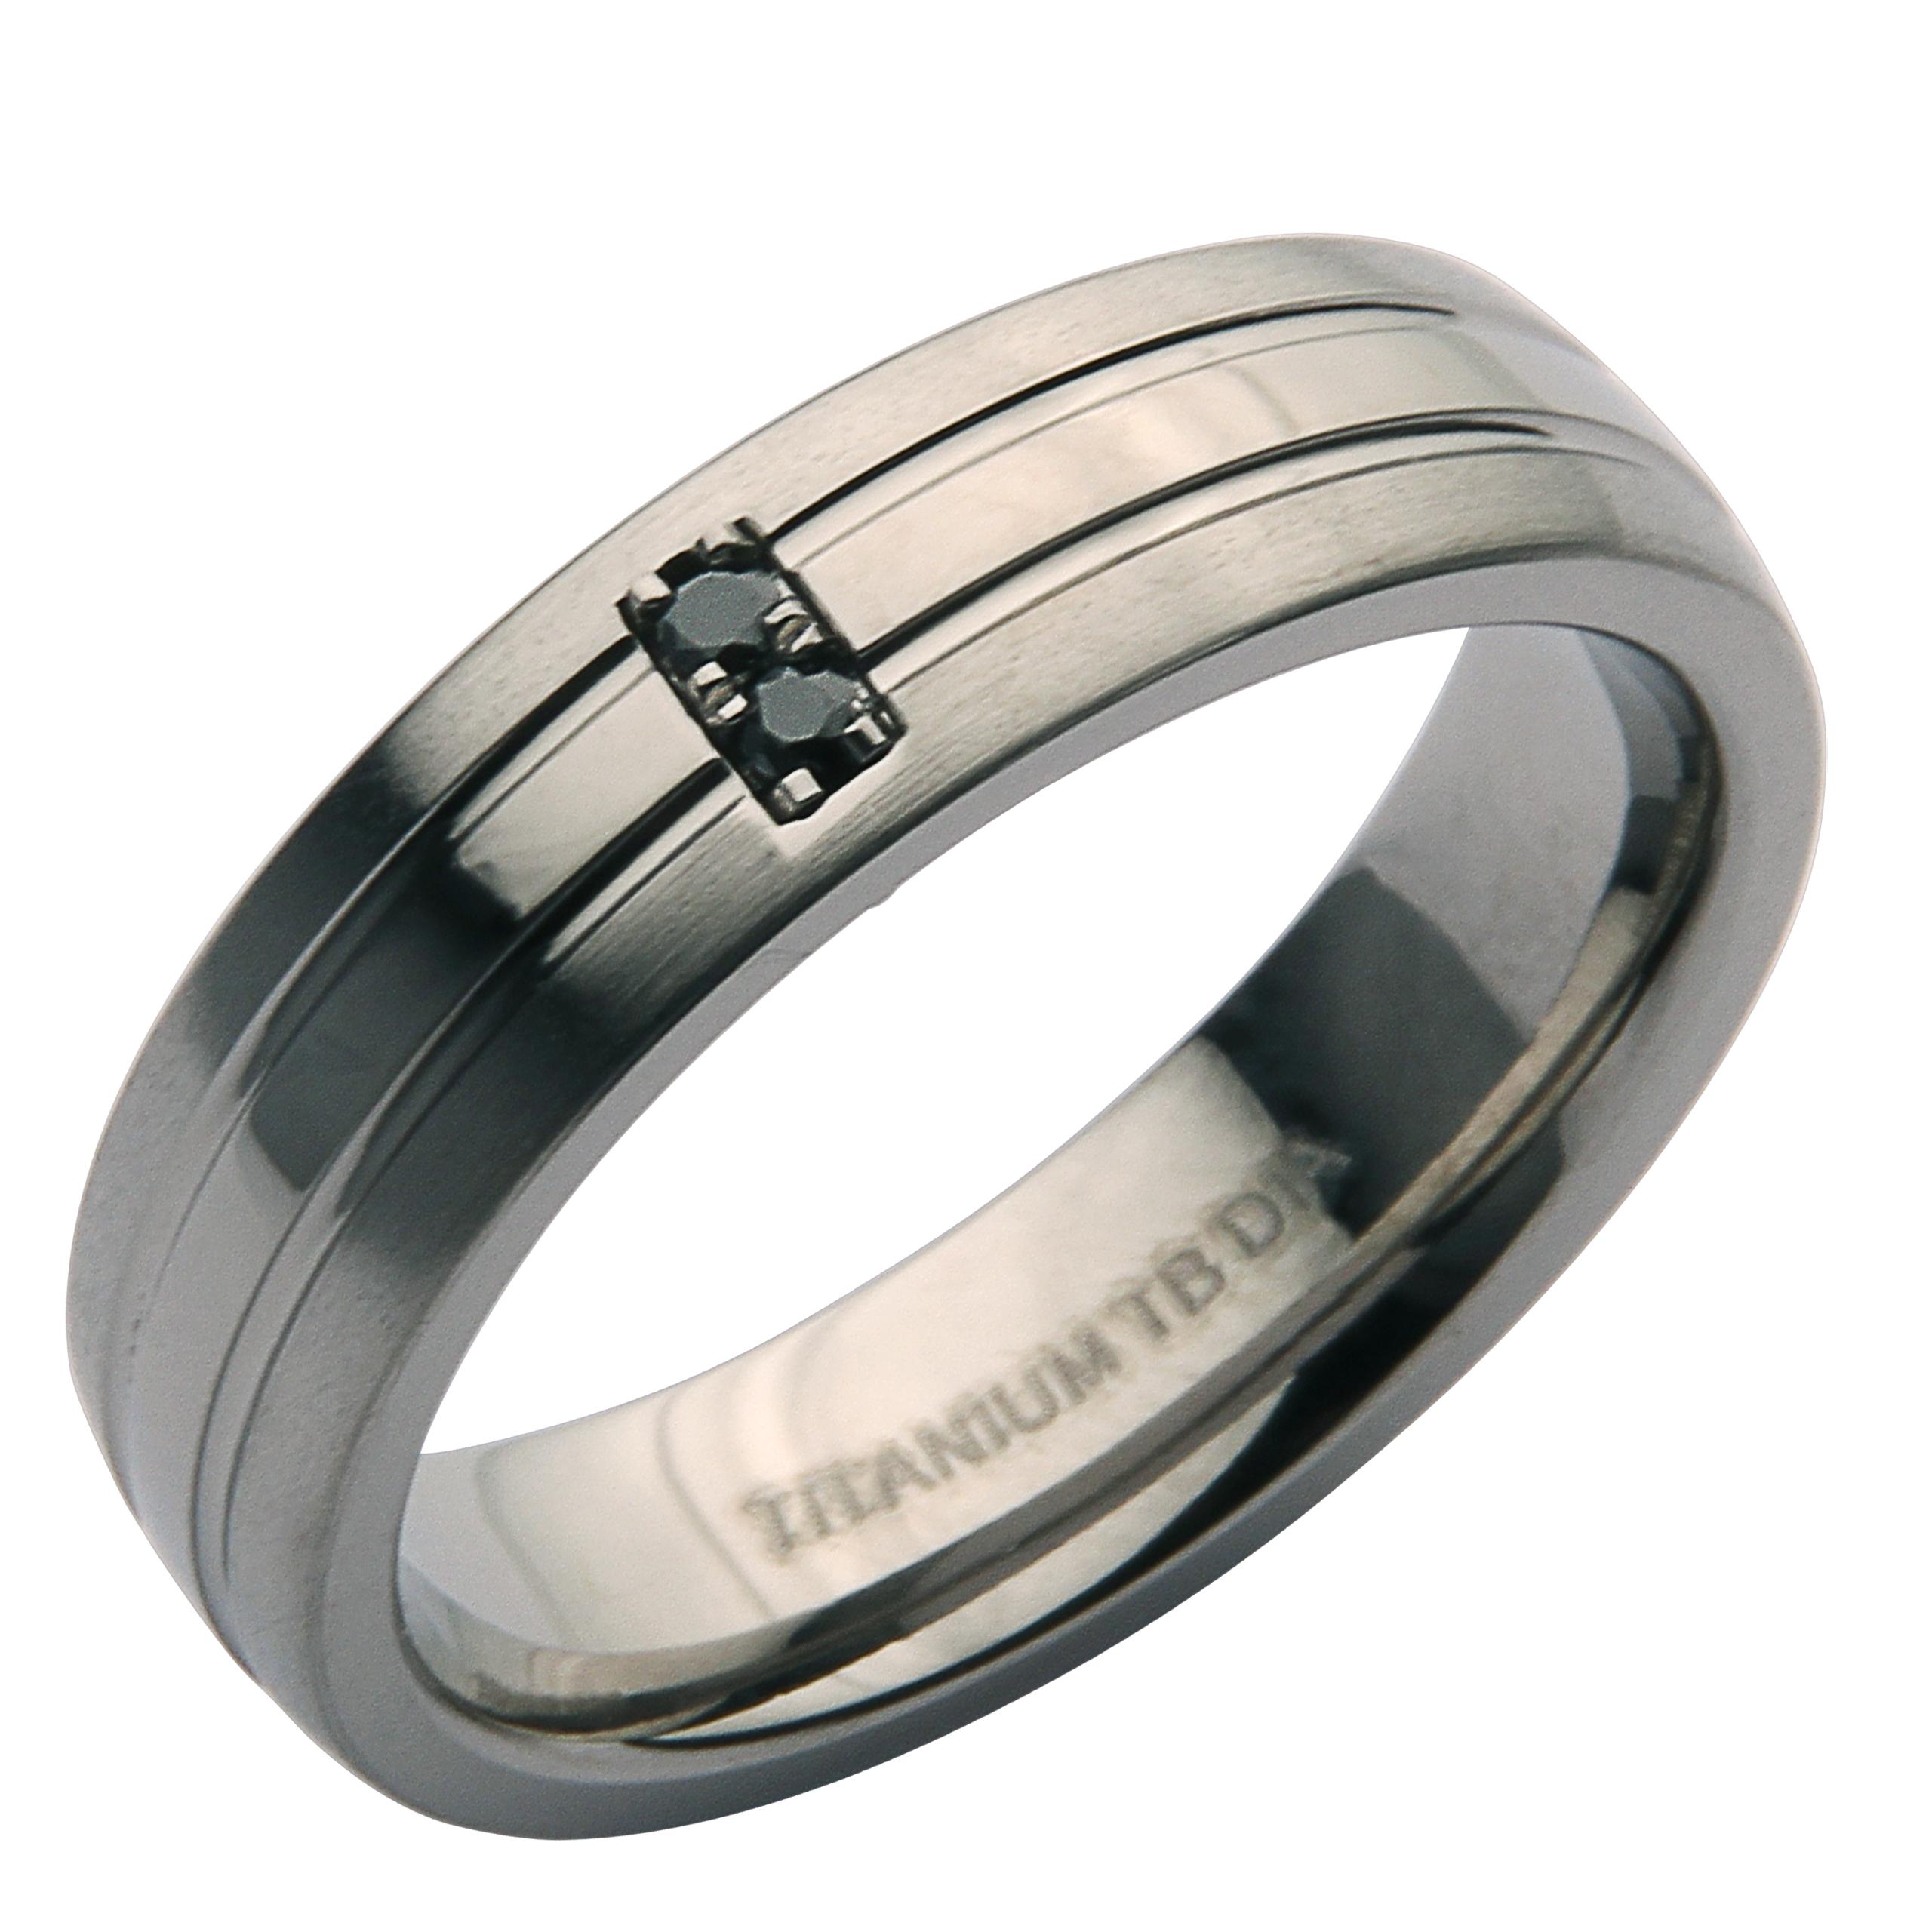 6mm Titanium Matt & Polished Black Diamond Ring